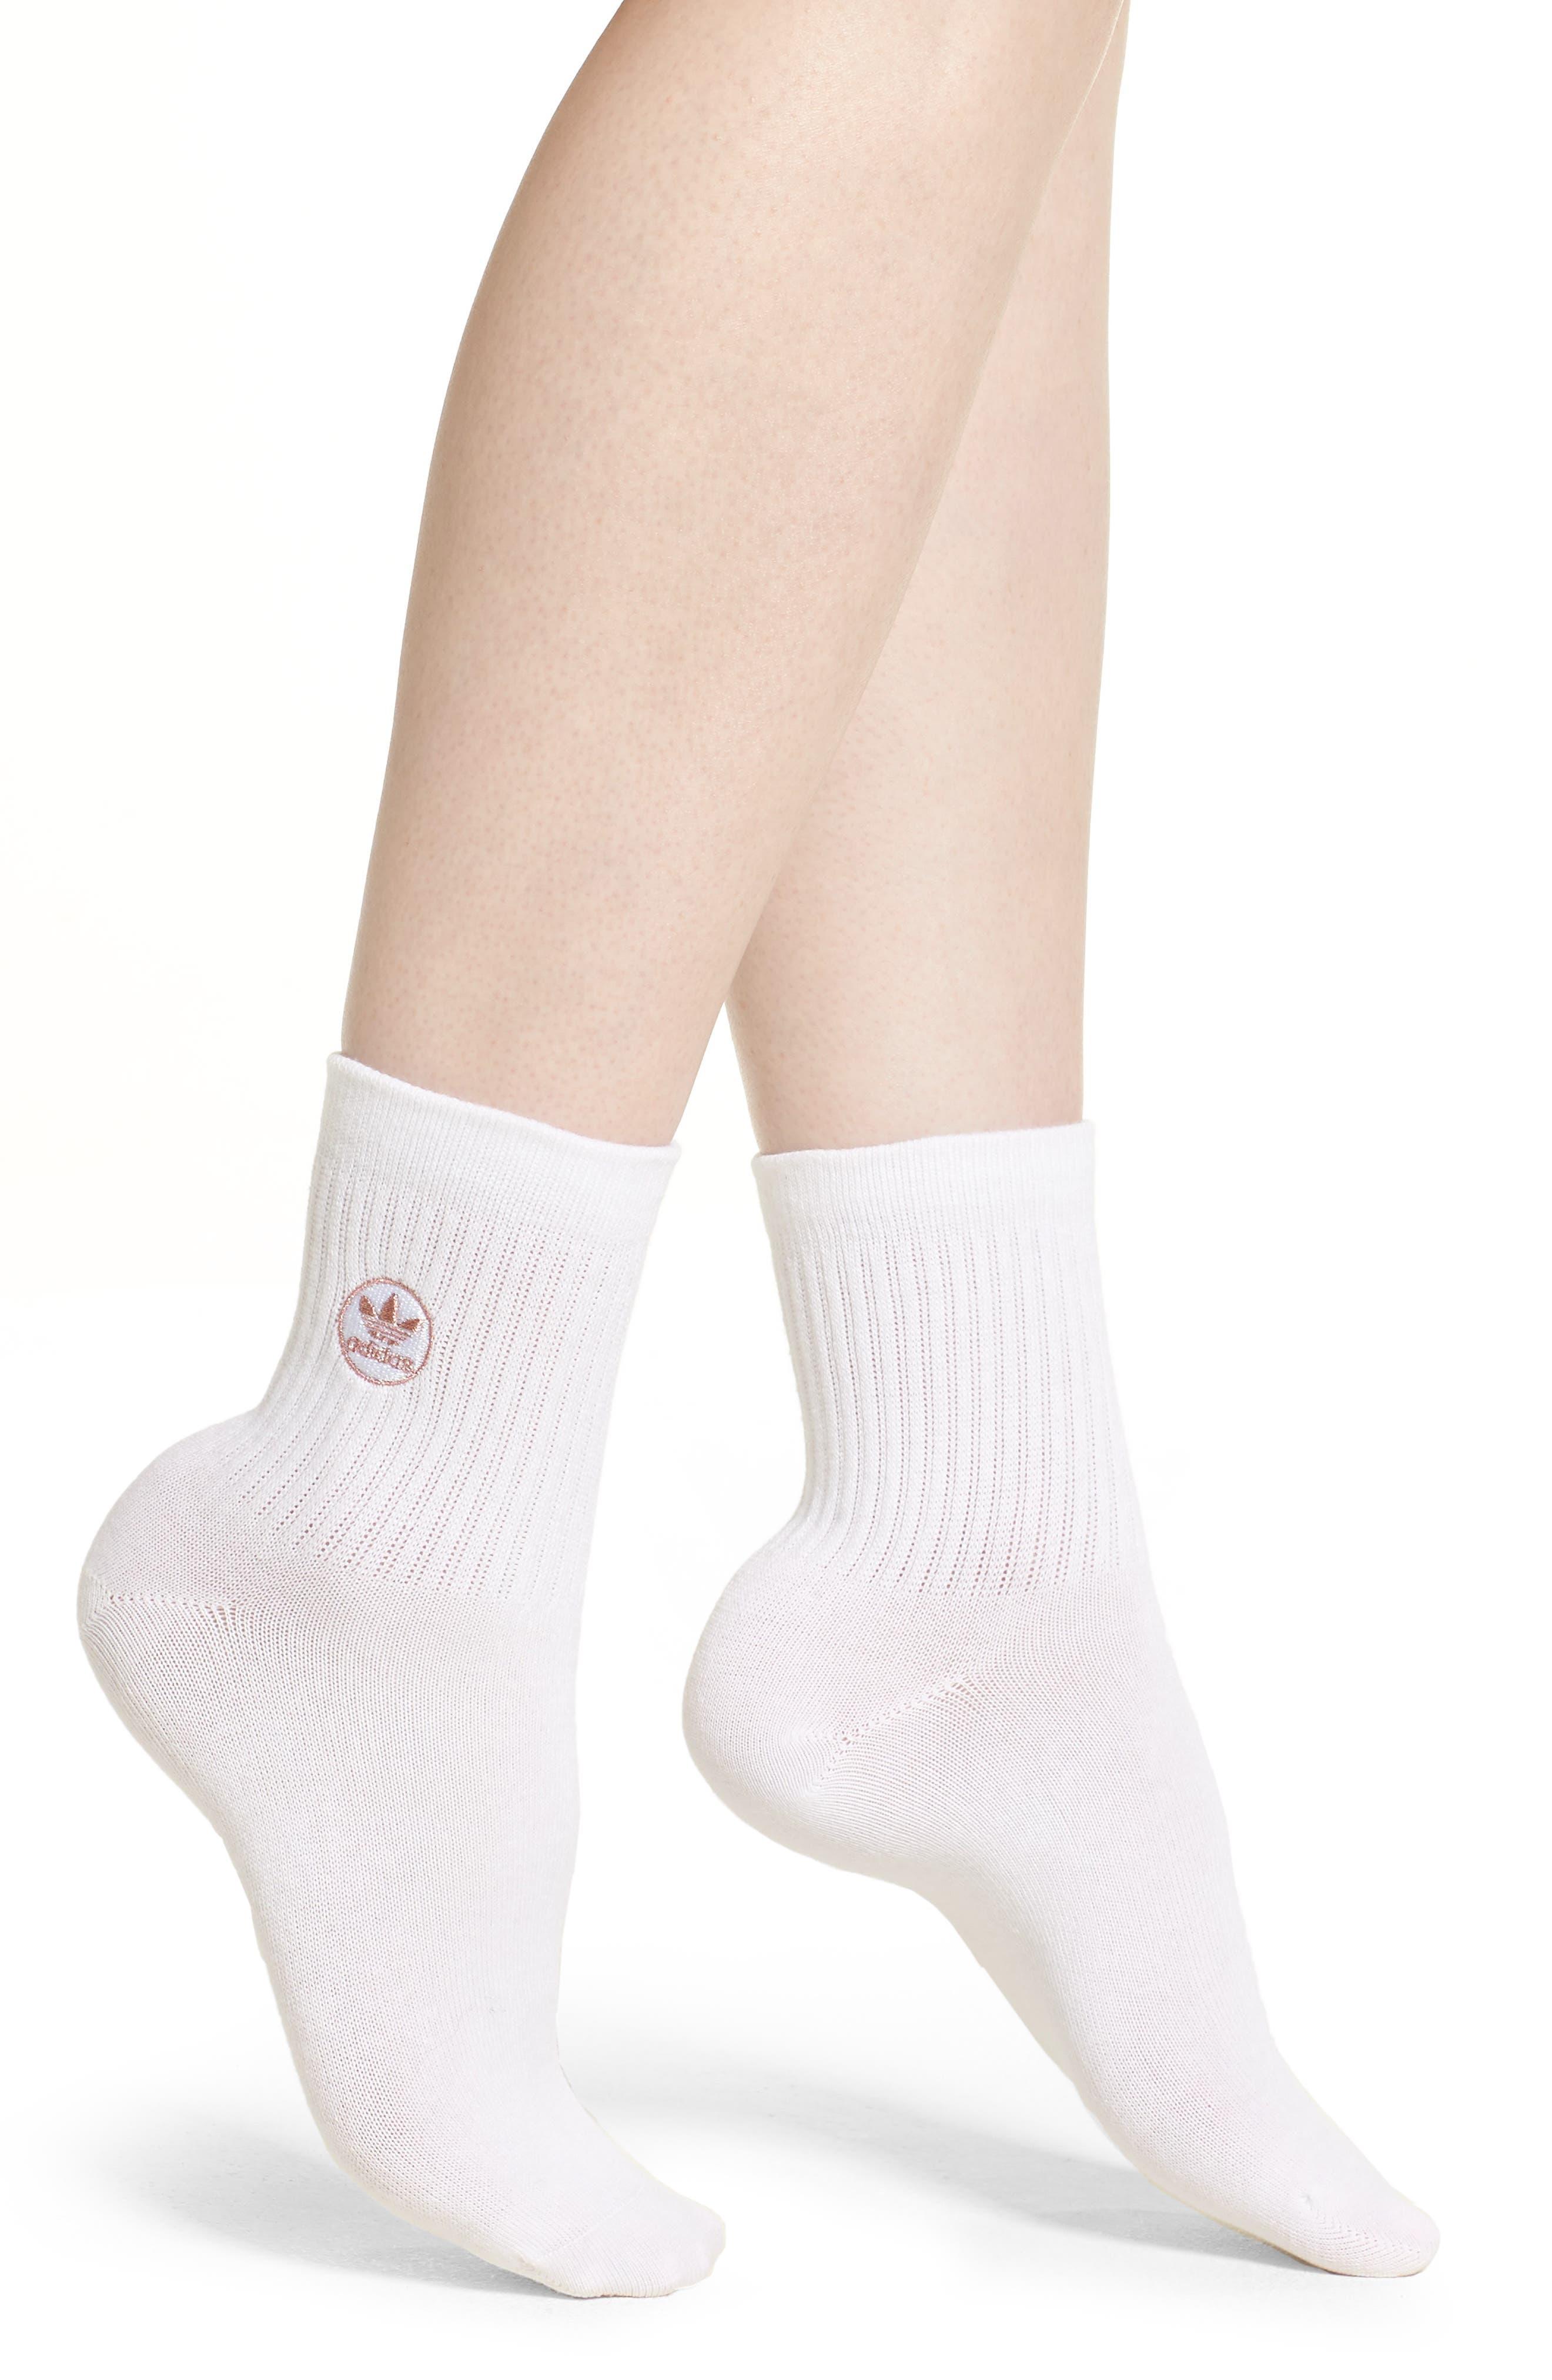 Quarter Crew Socks,                             Main thumbnail 1, color,                             WHITE/ ROSE GOLD